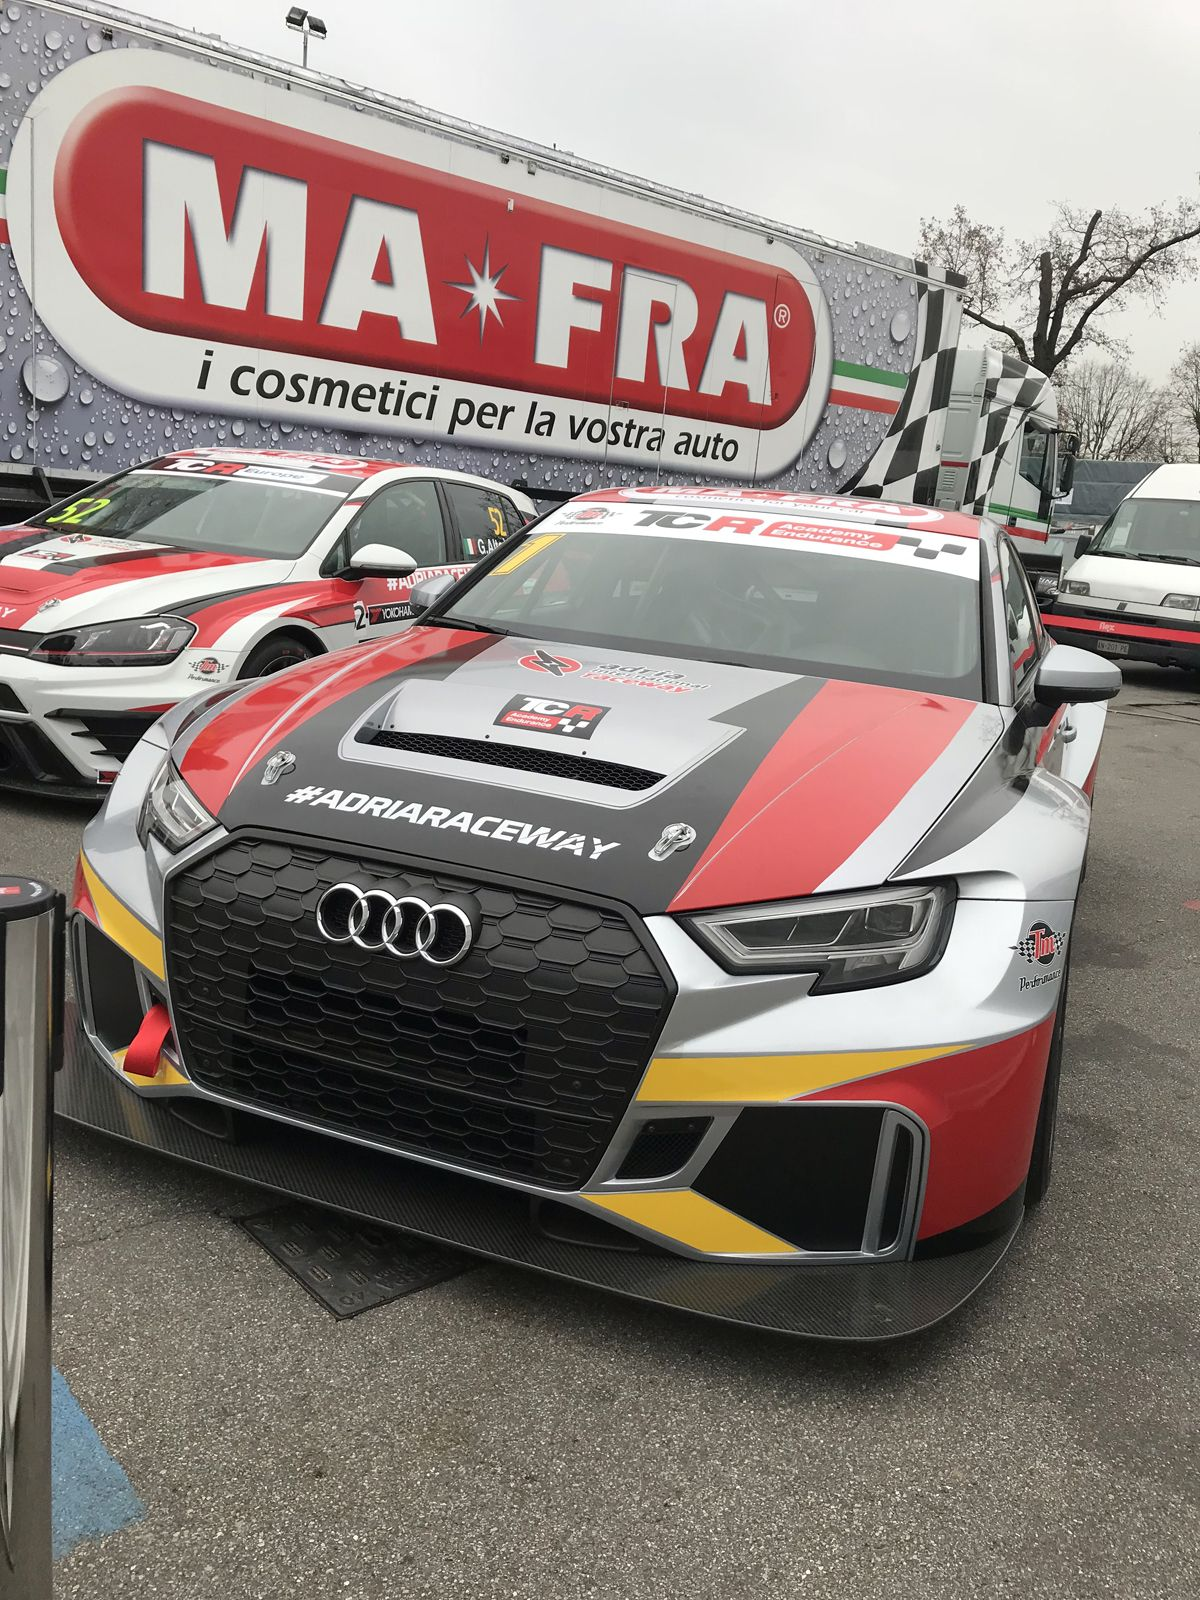 Monza rally show (12)